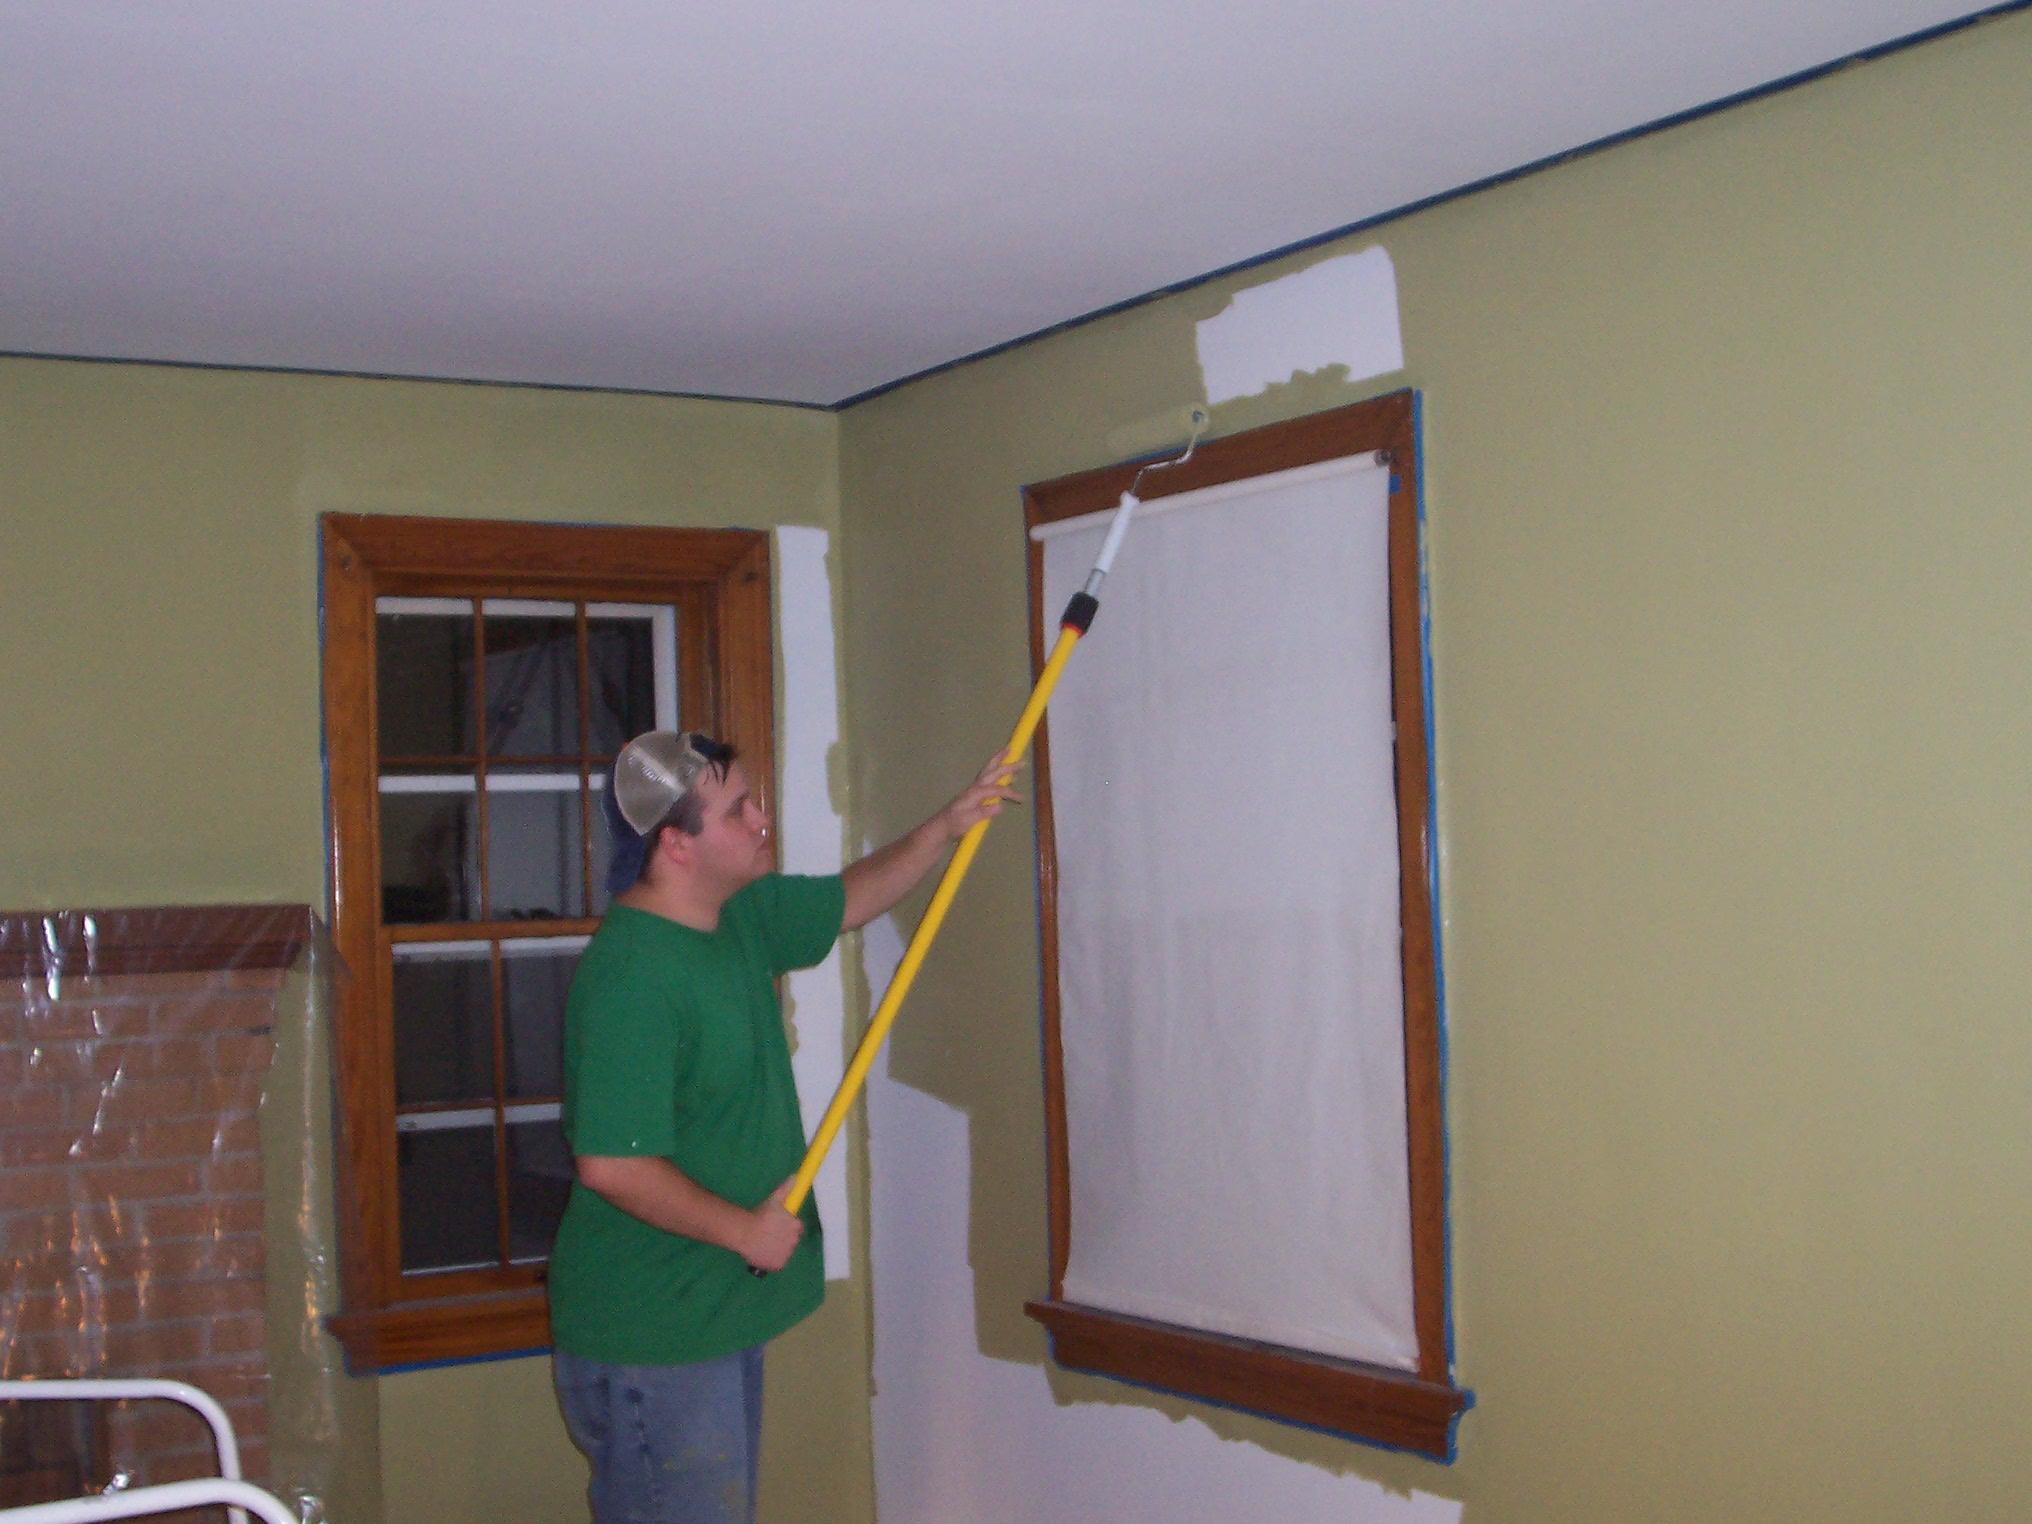 Living Room paint job | The Hyper House